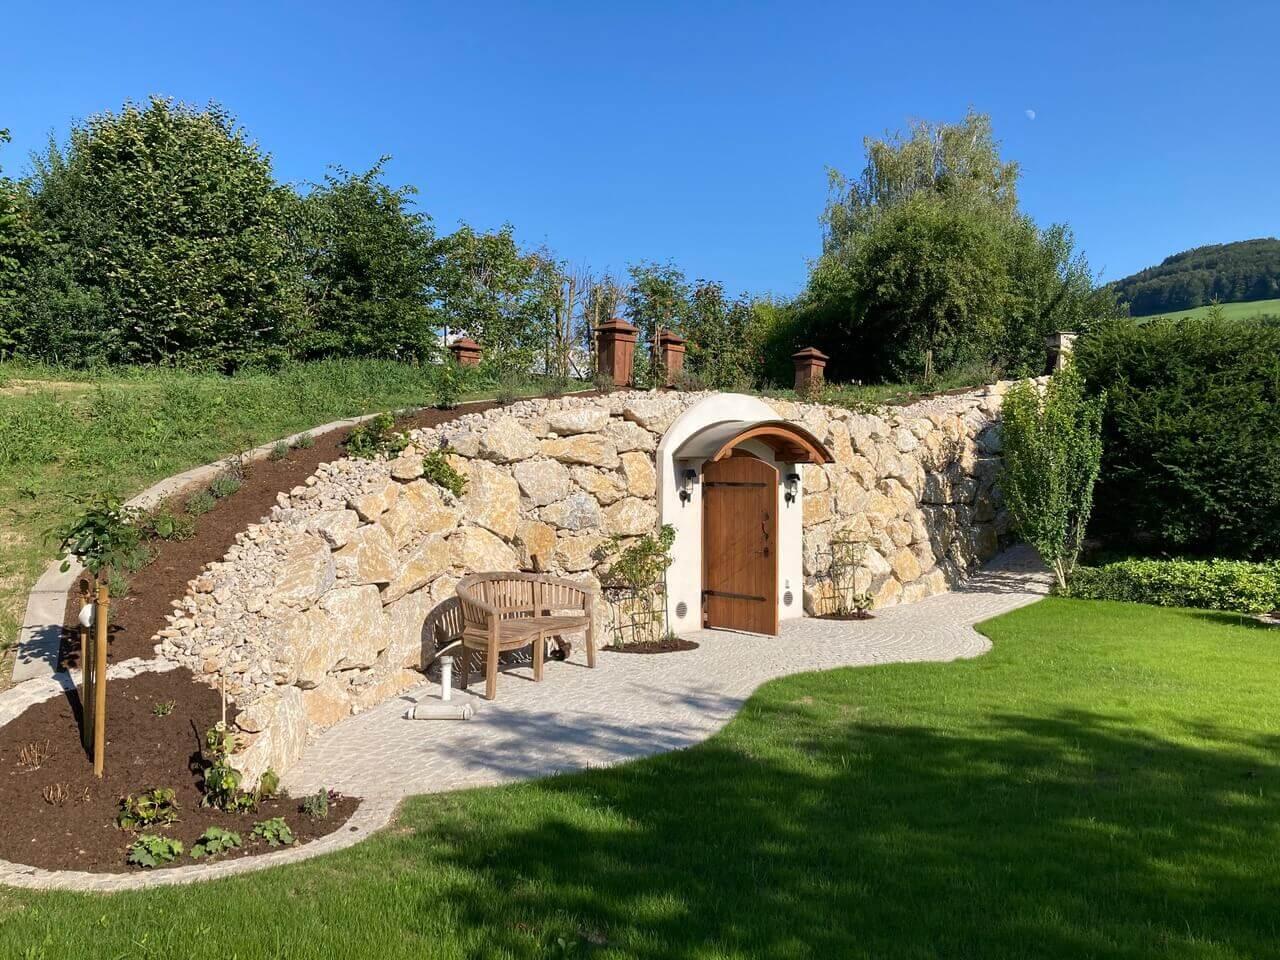 Veinikelder Austrias Wiesenfeldis